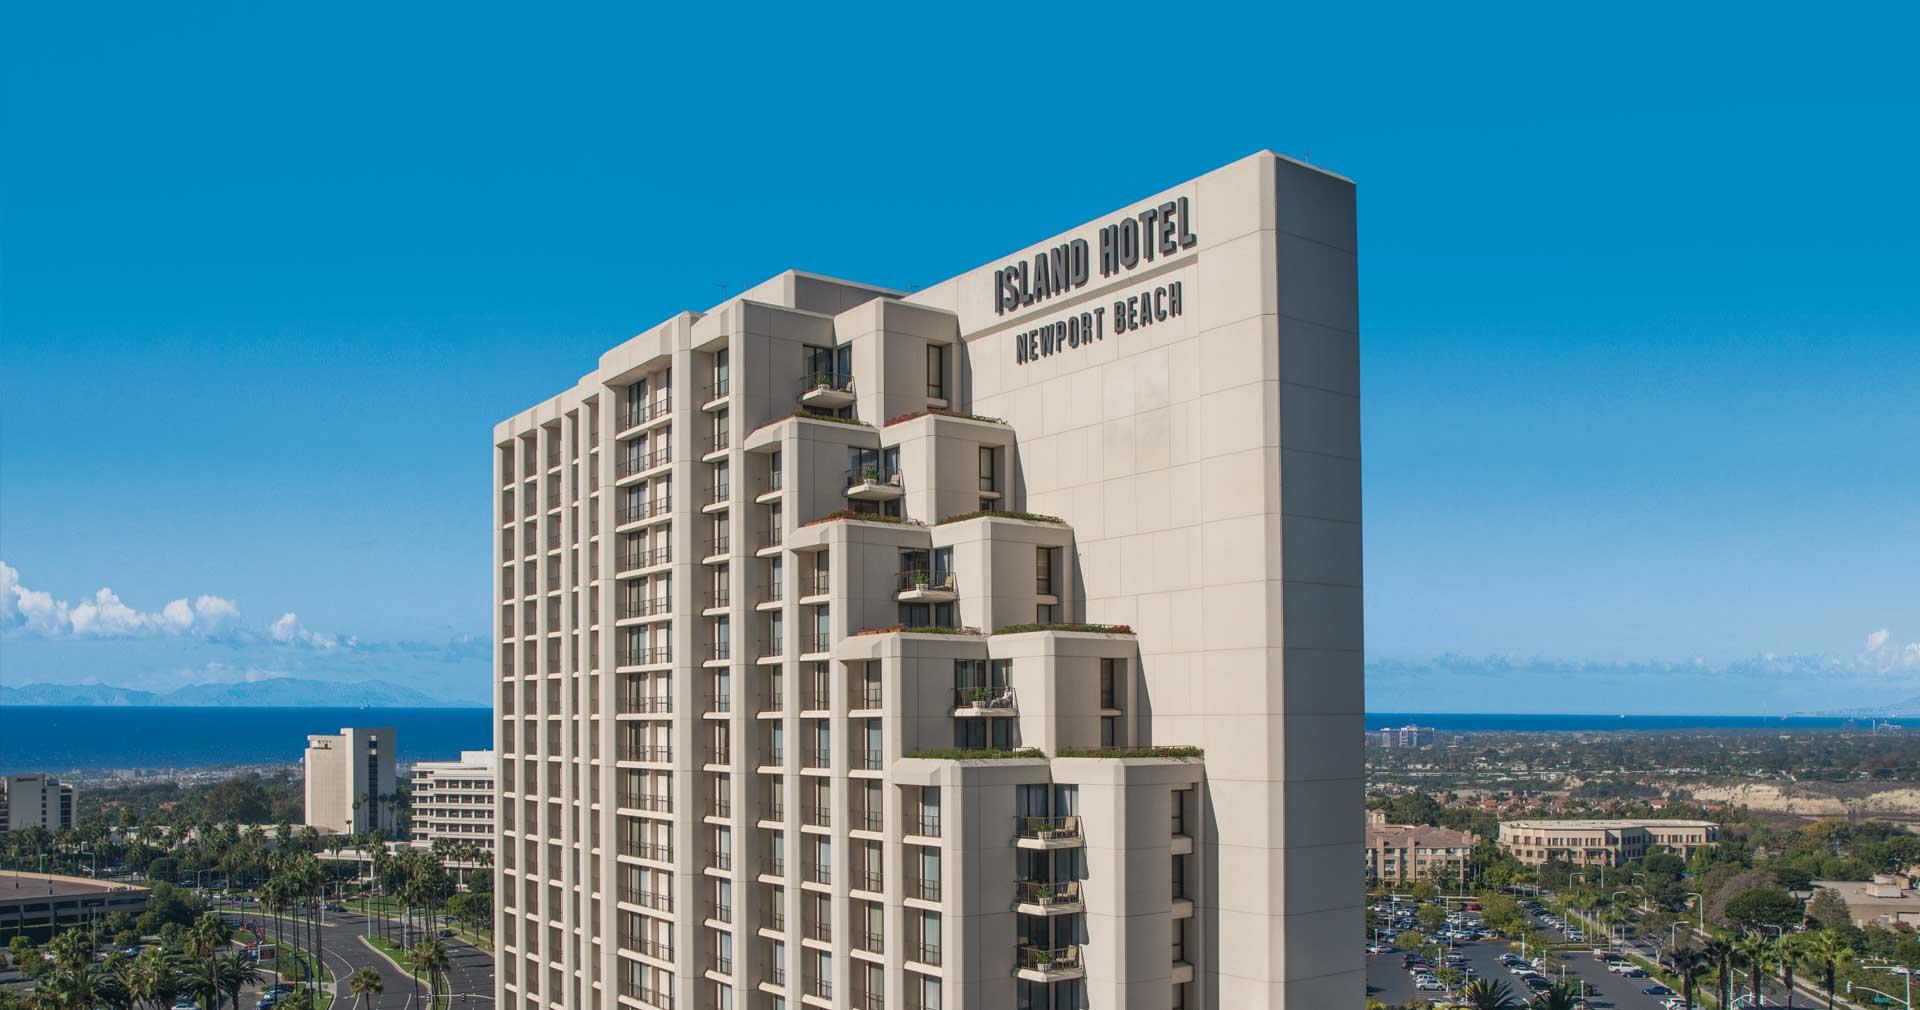 Island Hotel, Newport Beach, CA